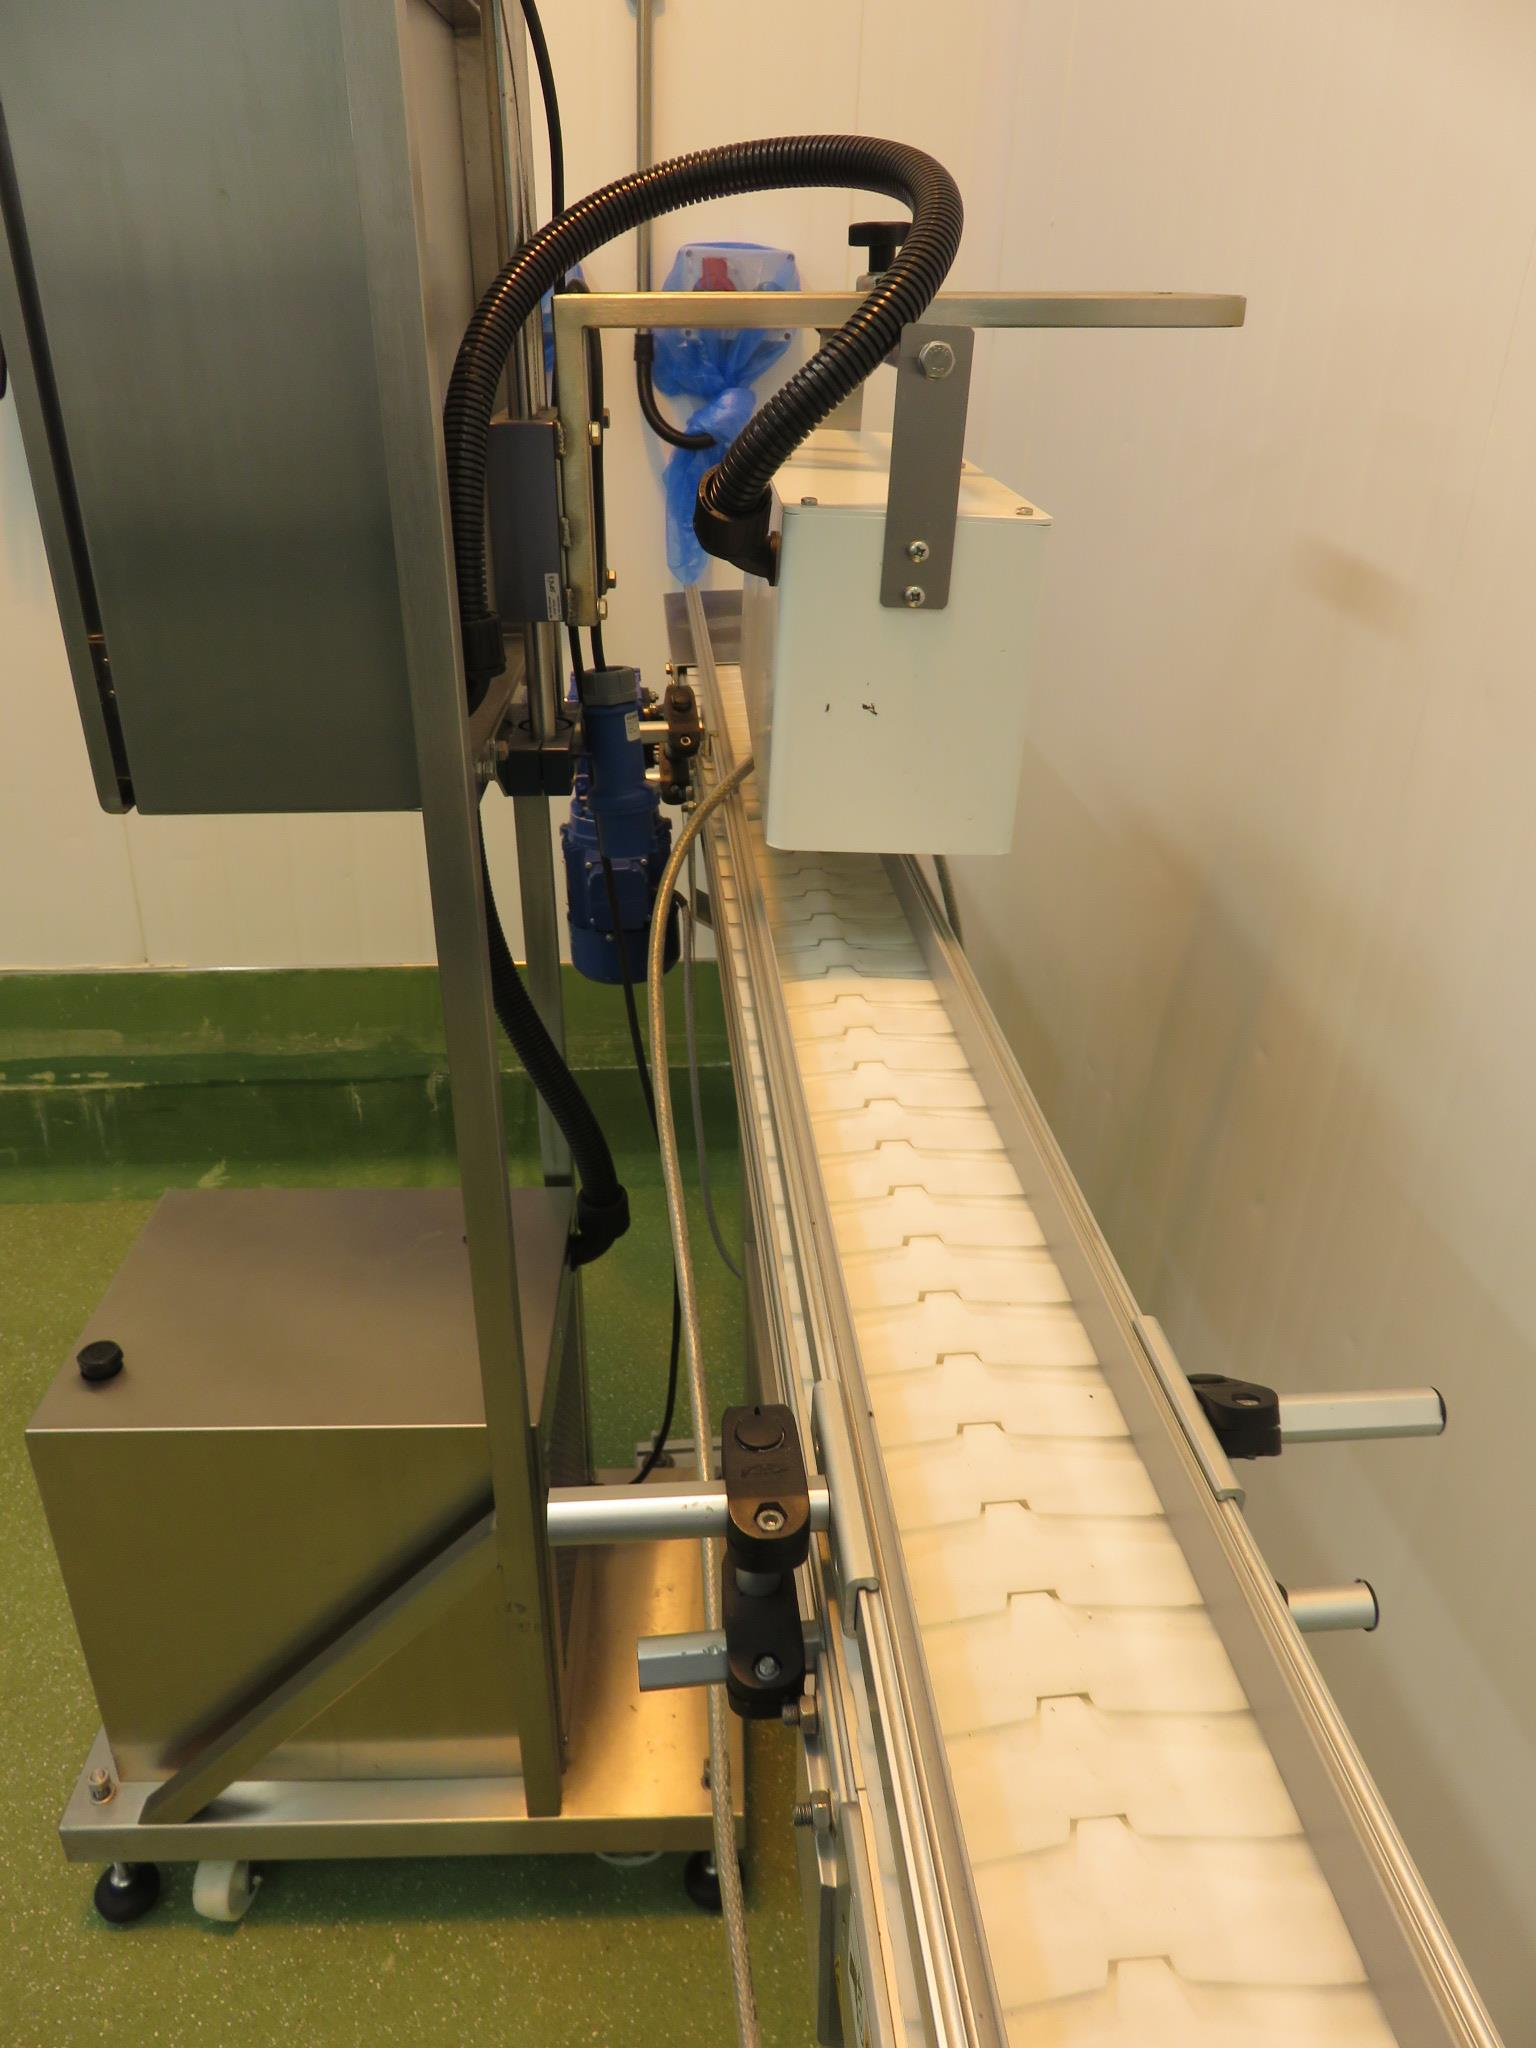 HF Technology induction sealing machine model MICS 2. LO £60. - Image 4 of 5